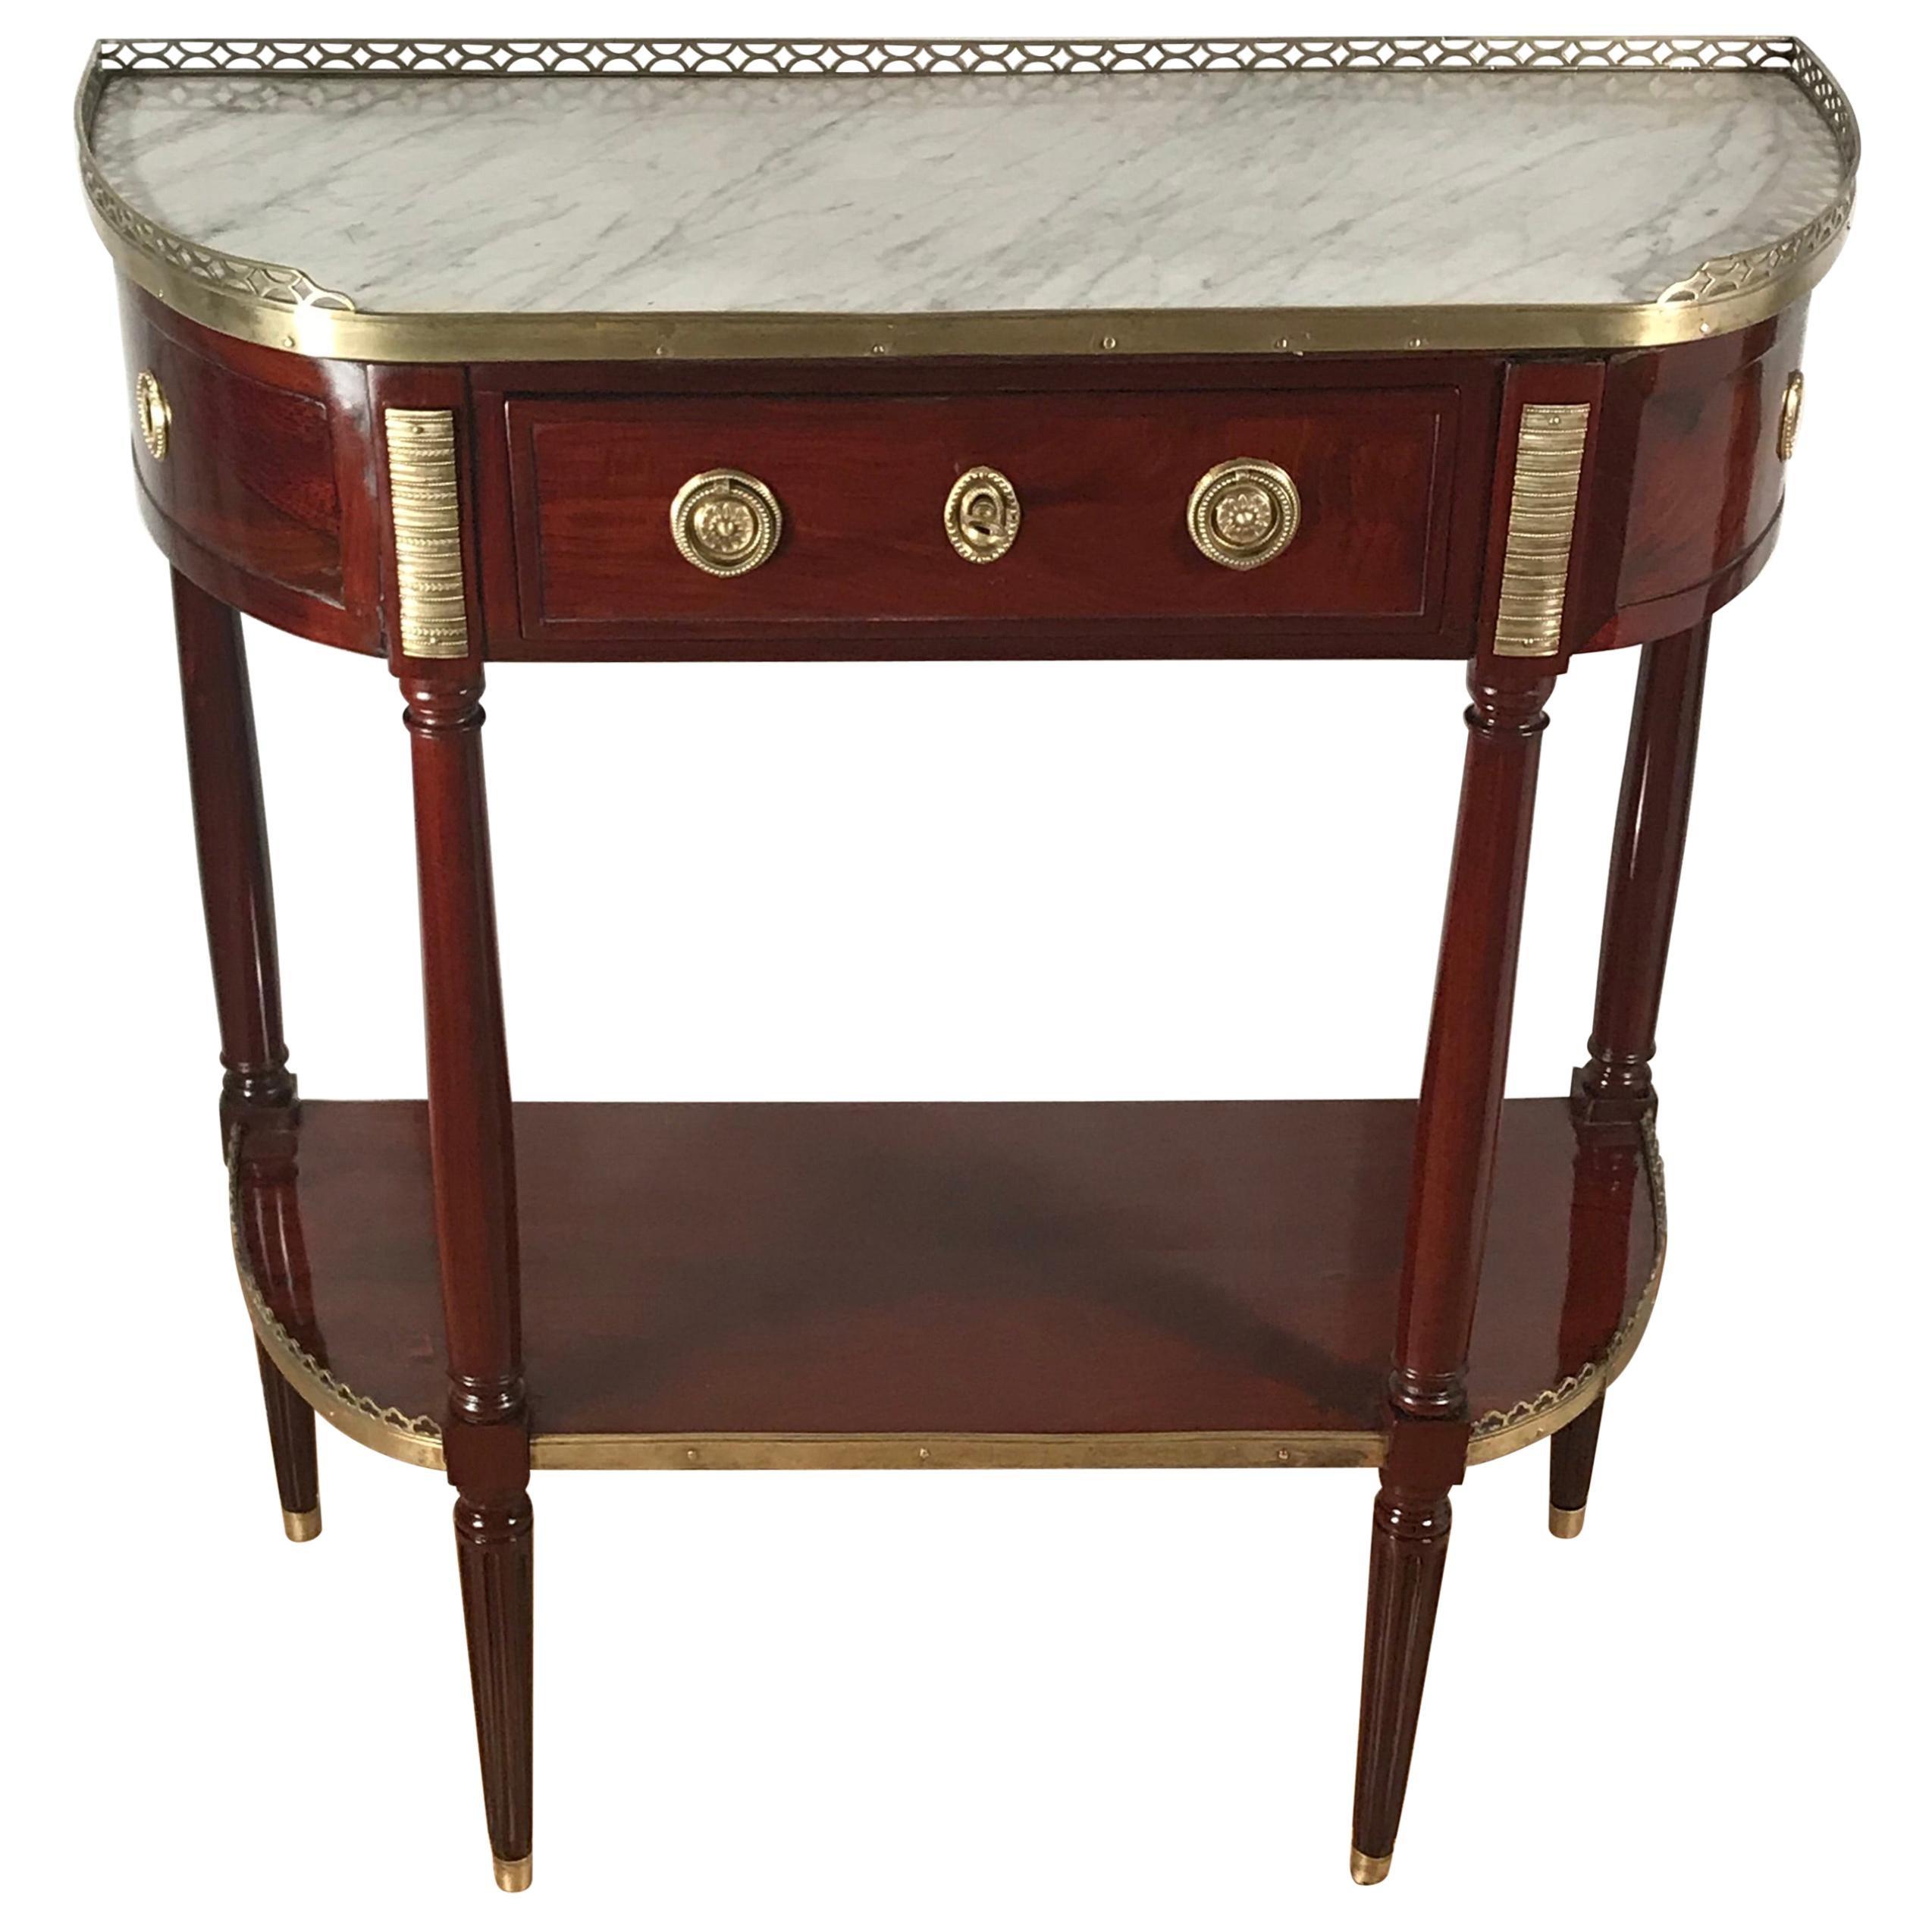 Directoire Console Table, France, circa 1800, Mahogany